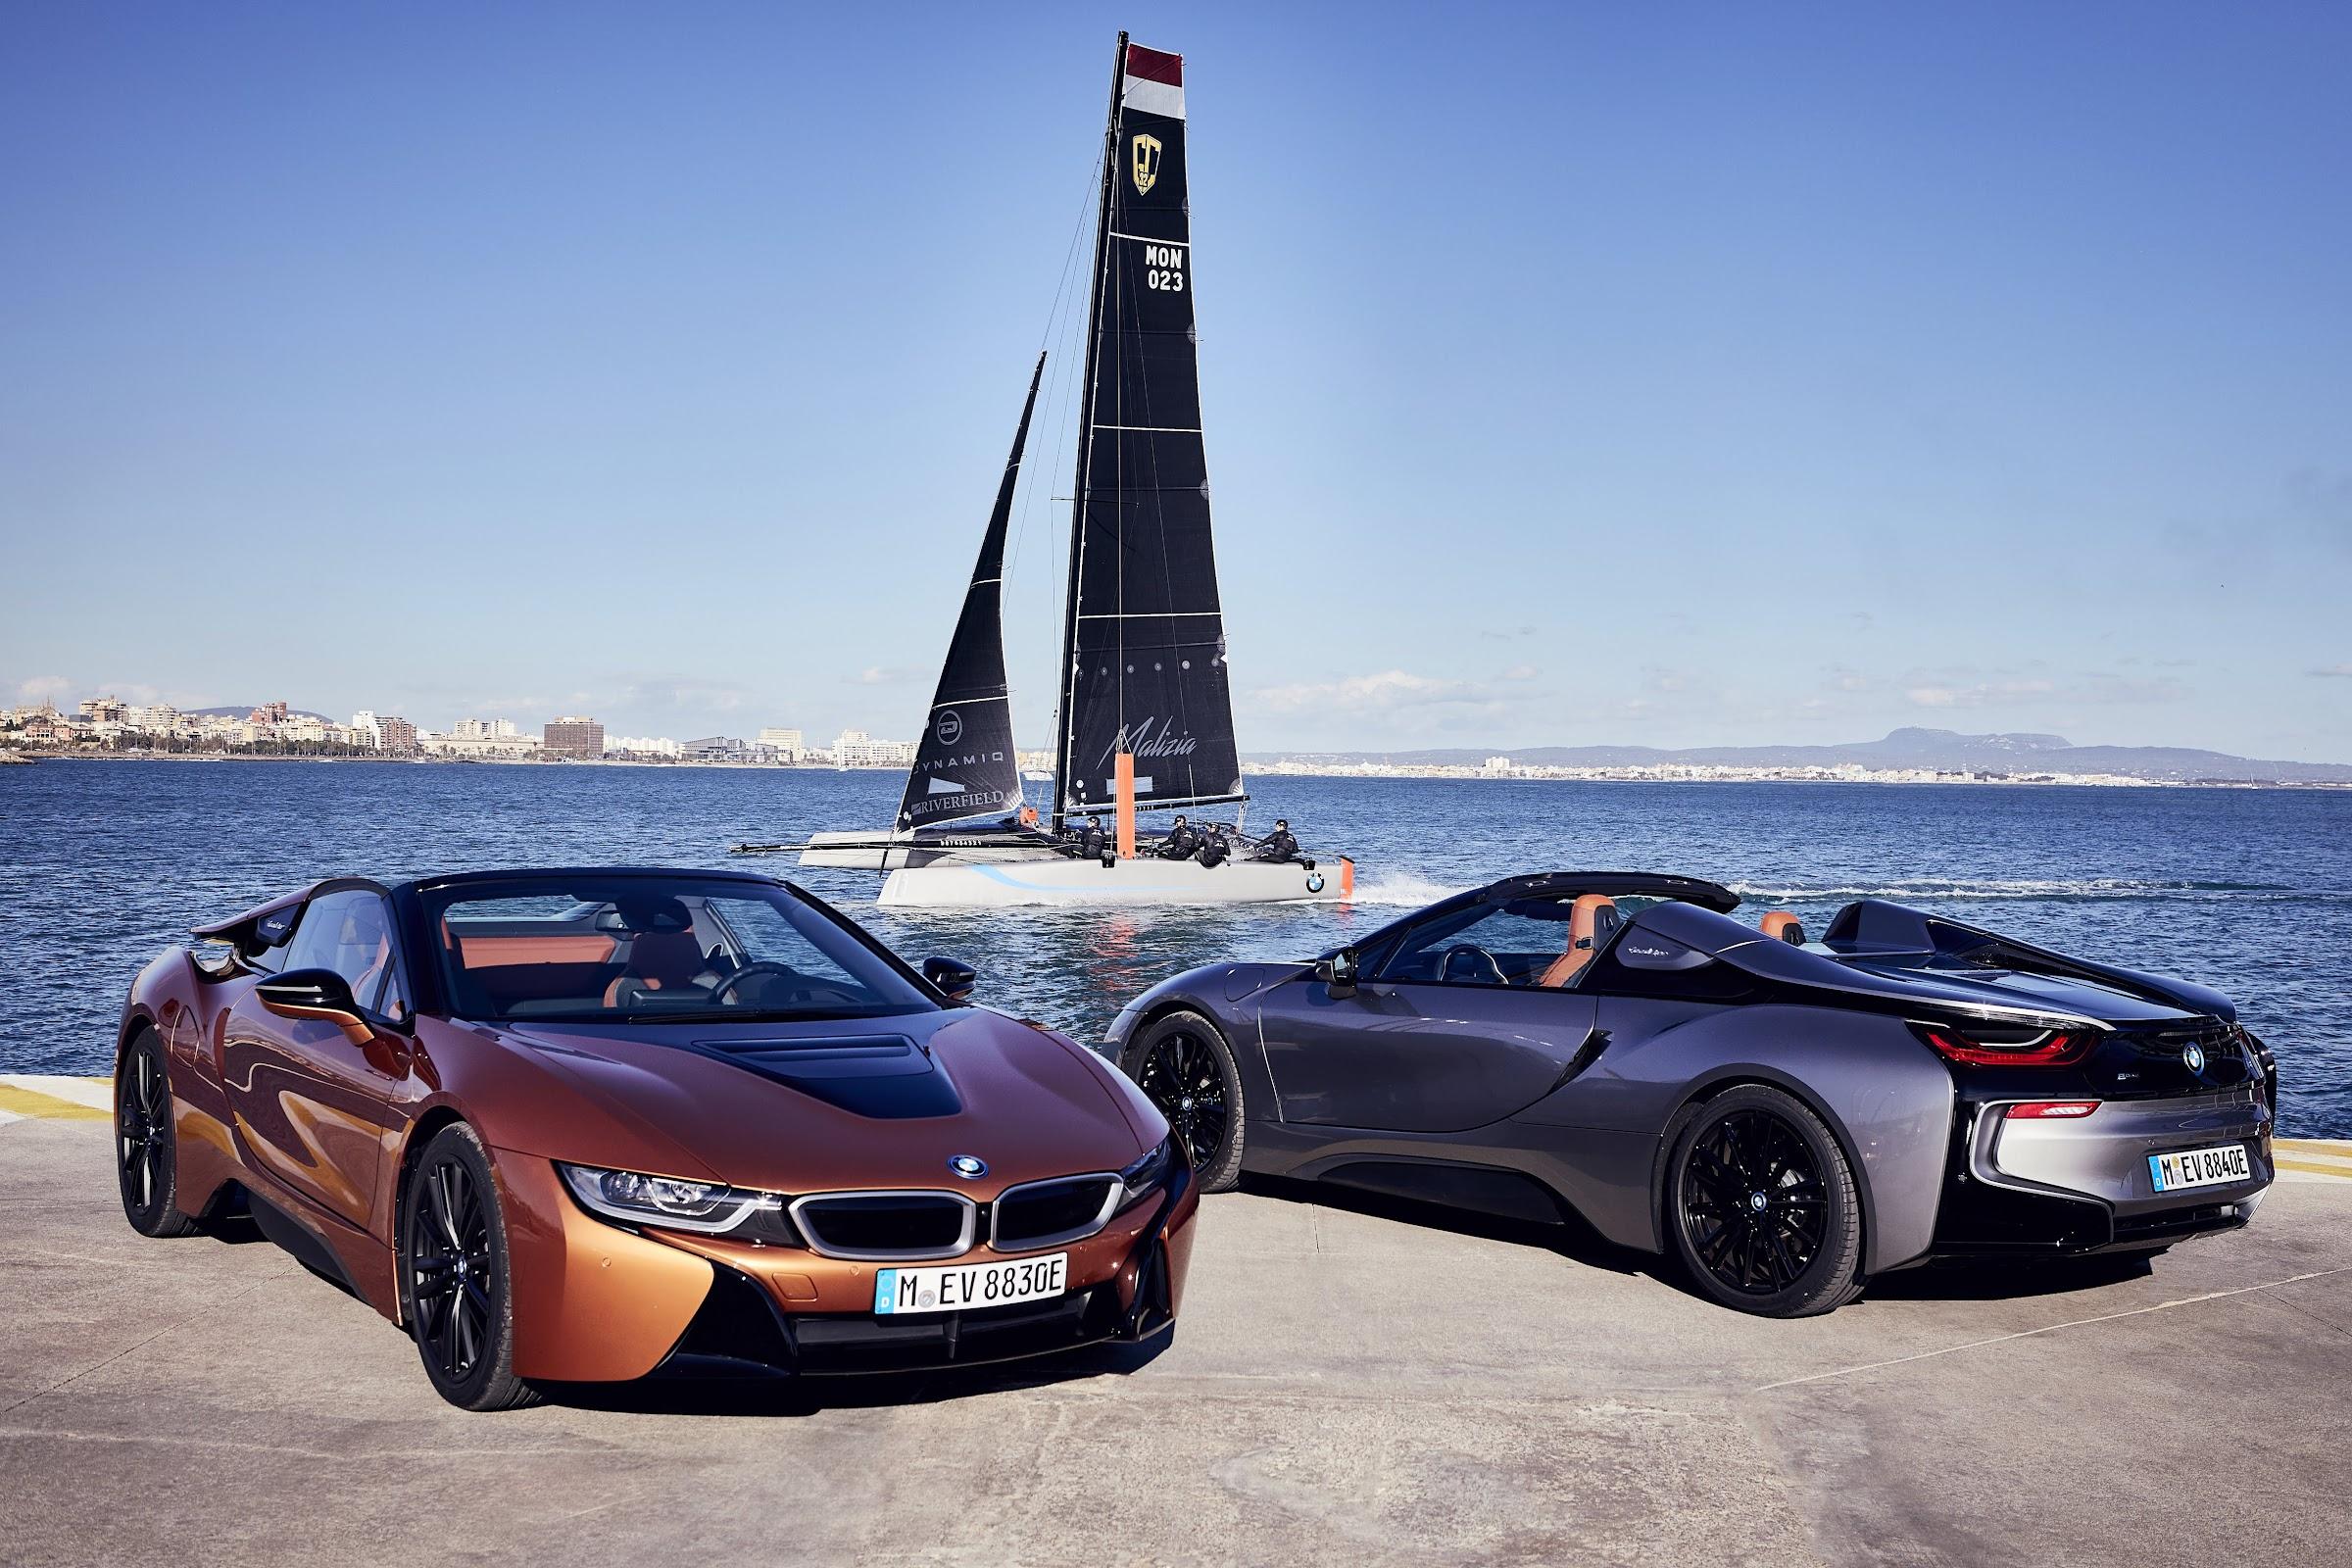 R0ajno BfwogrN7hxu1ziOZDav6hjZ Whb2bAmBa26xRN6k4jGjr4CPgbh4CQunaAYkeC zuys3YY9z5x63Rx2f9nKcrRXcP89vE61IOlHpn78gssd0cdt52OBM4f1NEXGfLSvcKJQ=w2400 - El BMW i8 Roadster se exhibe por Mallorca (fotografías y video)